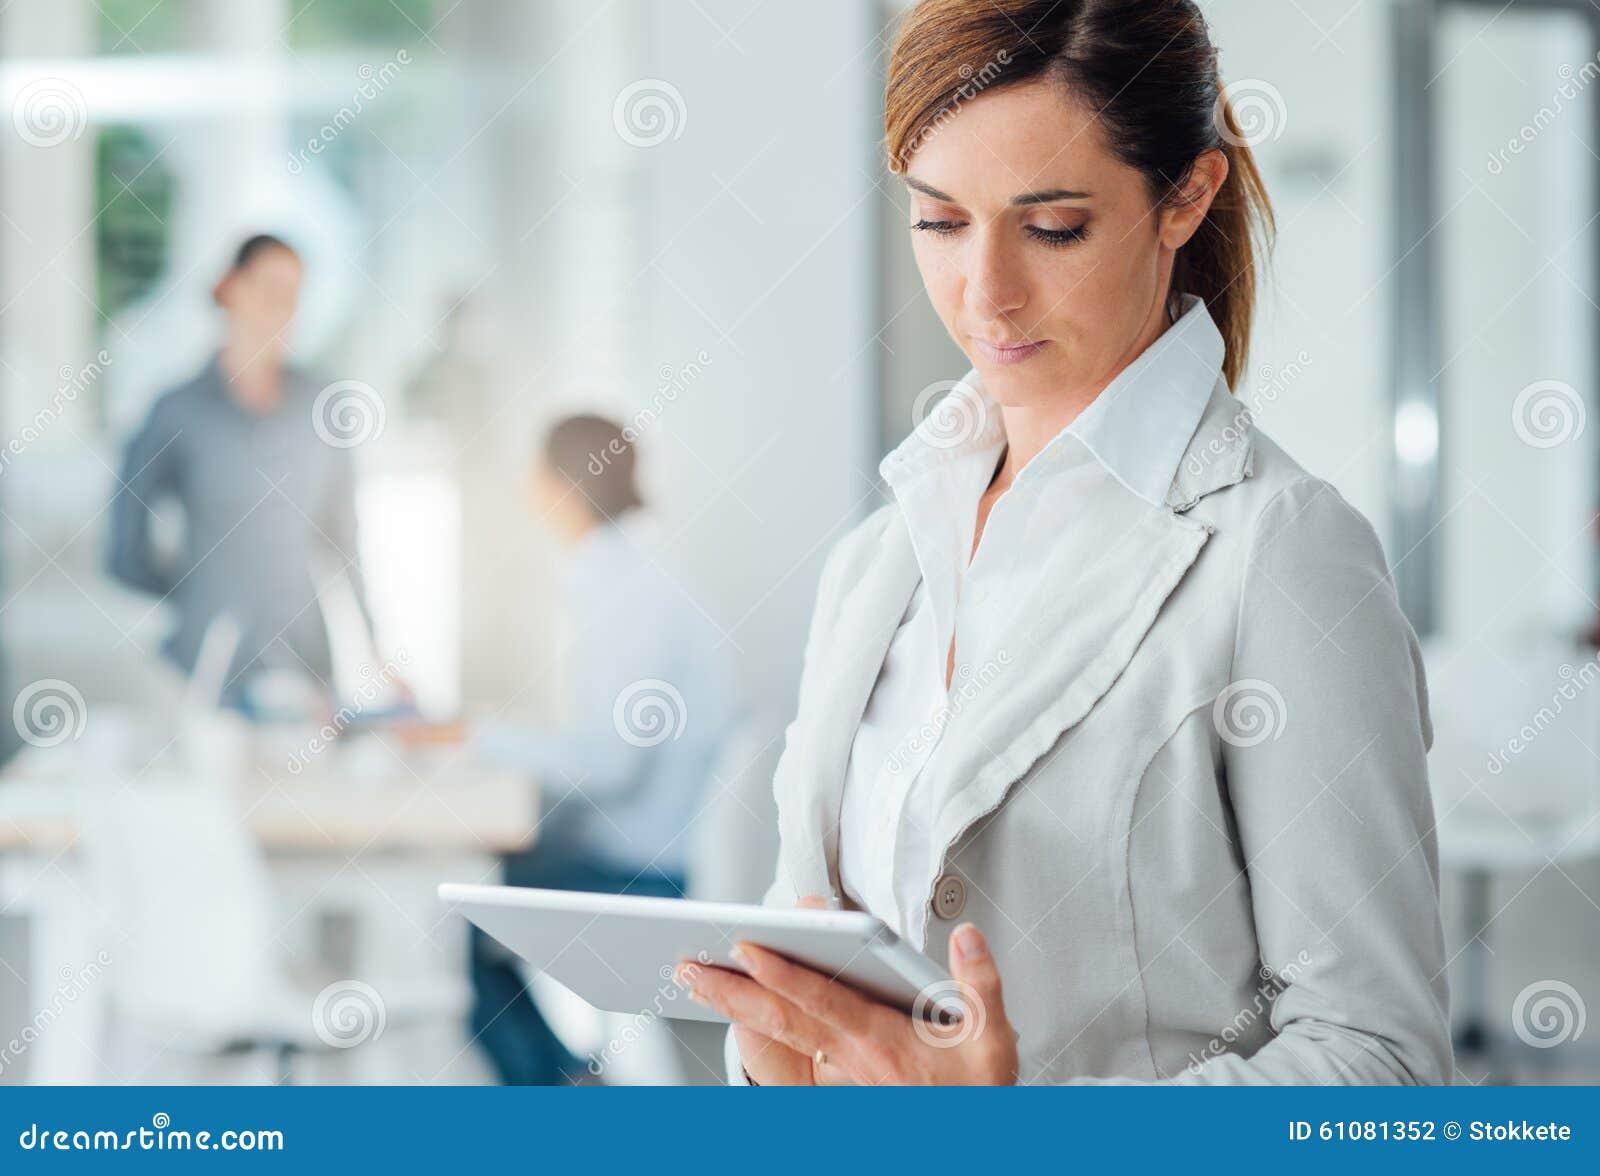 business women Professional